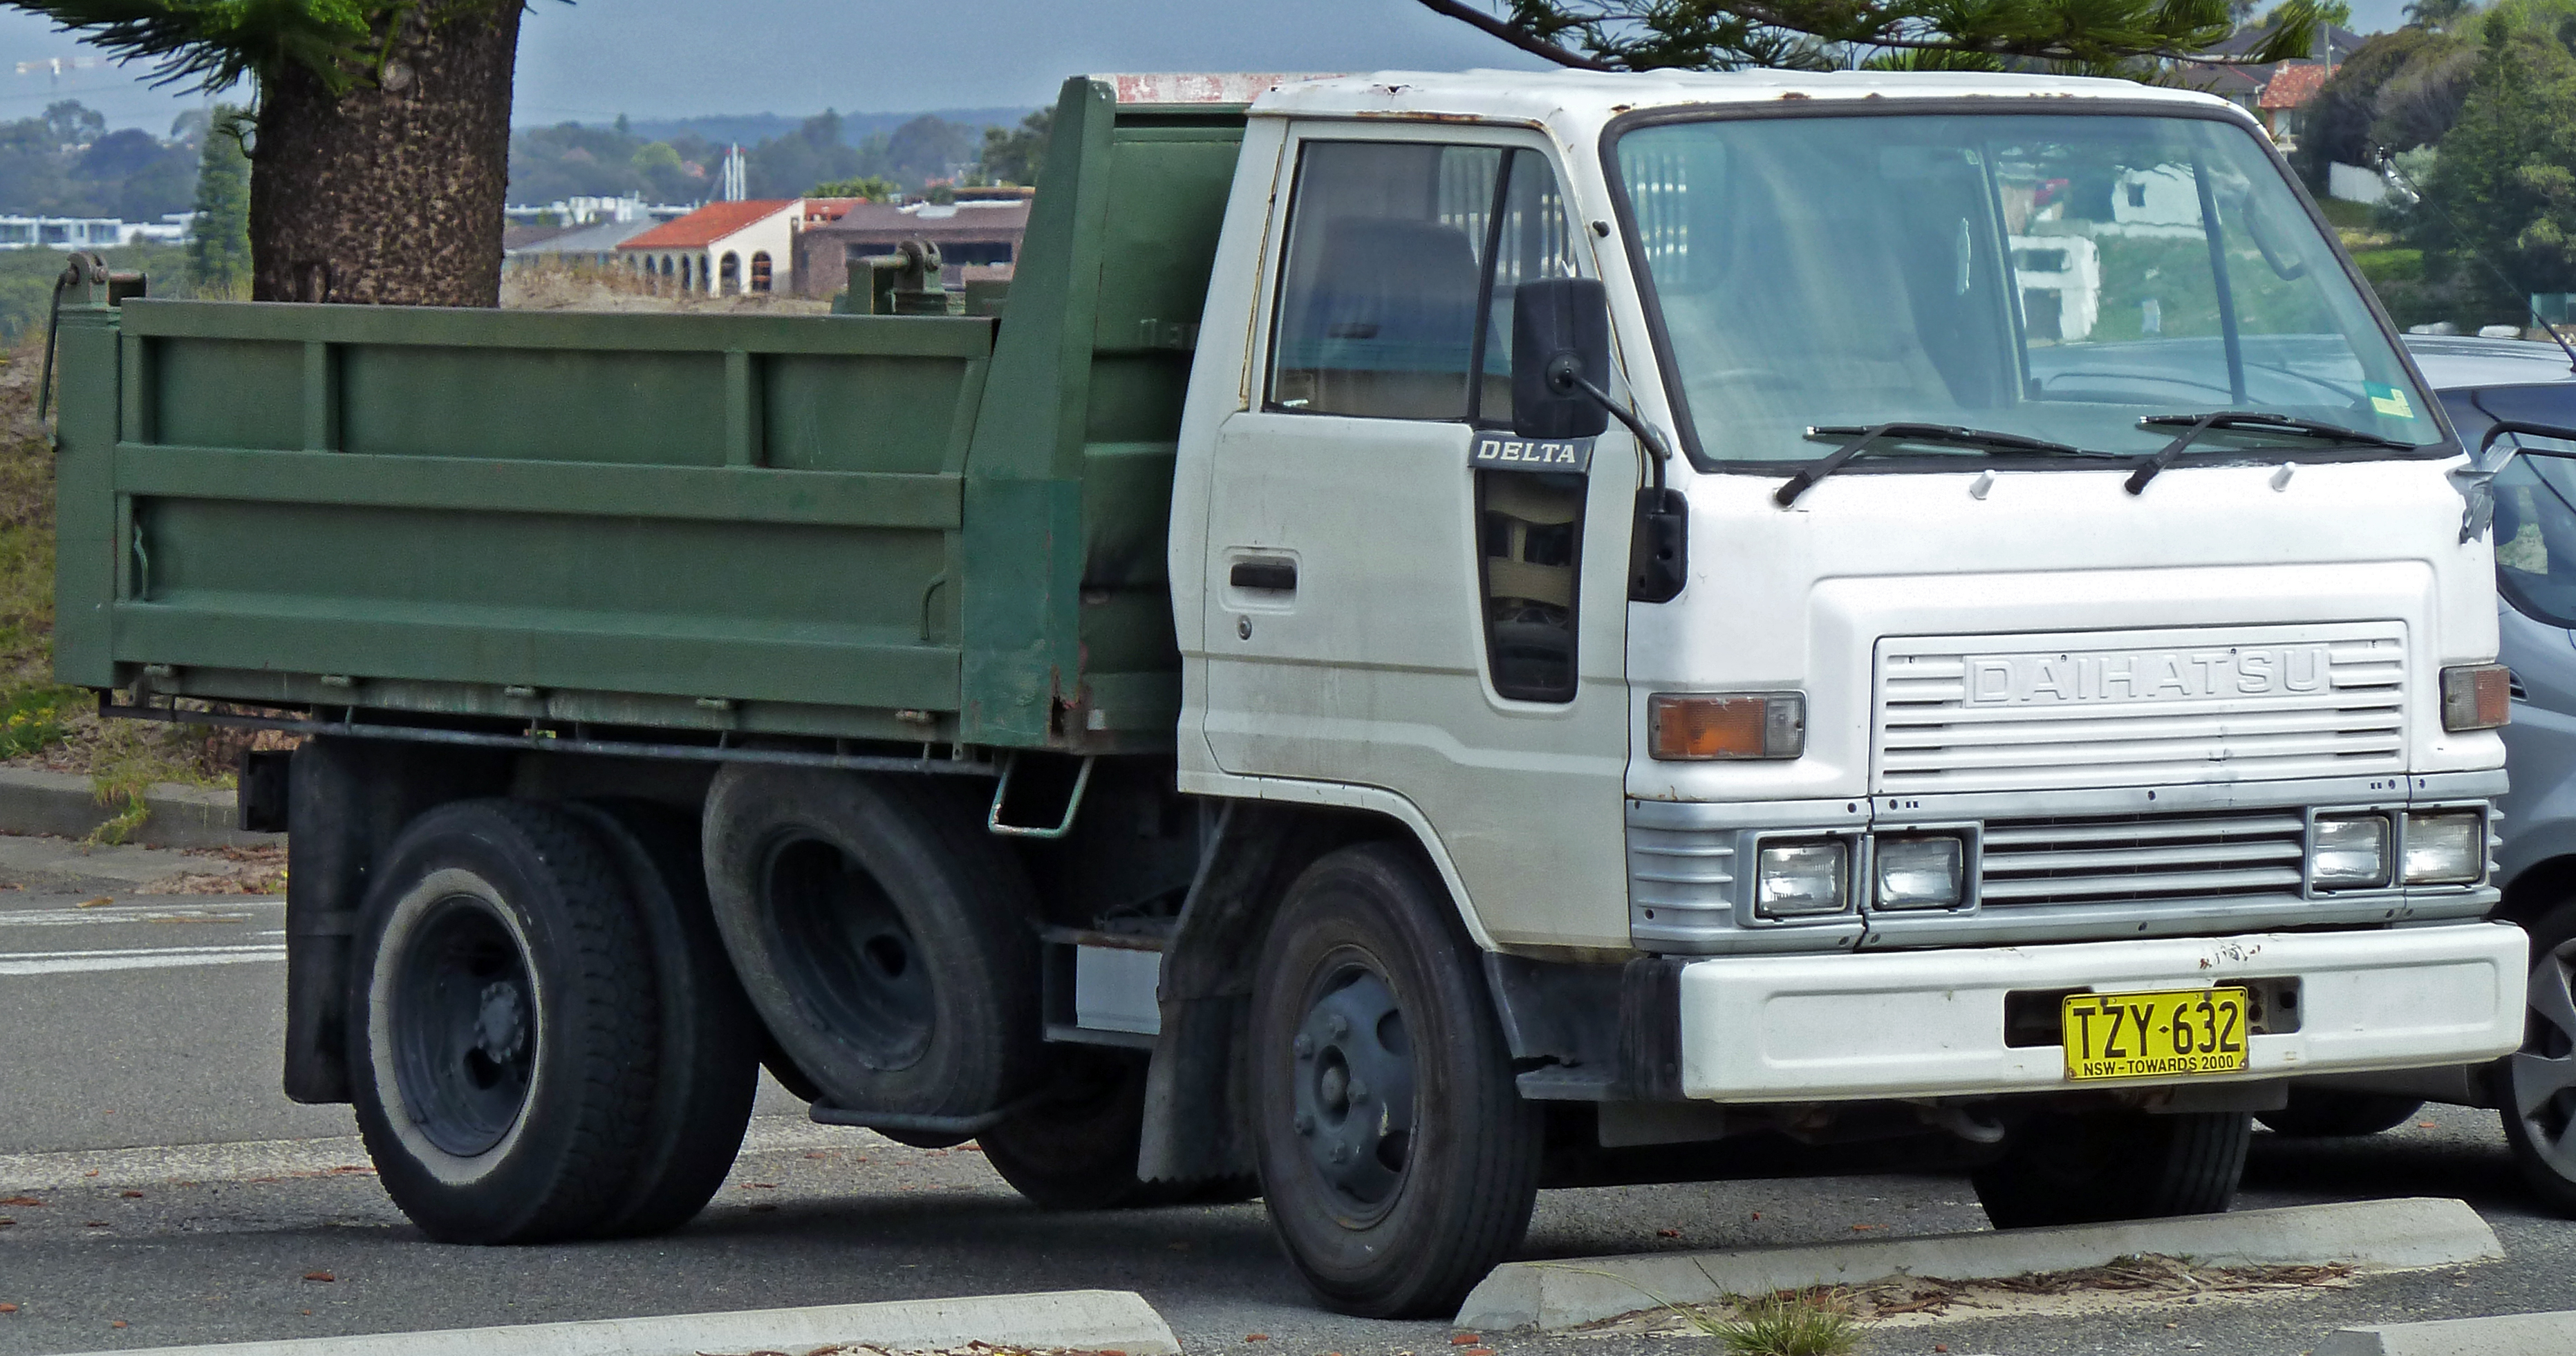 File1985 Daihatsu Delta 2-door truck (2010-09-23) & File:1985 Daihatsu Delta 2-door truck (2010-09-23).jpg - Wikimedia ...